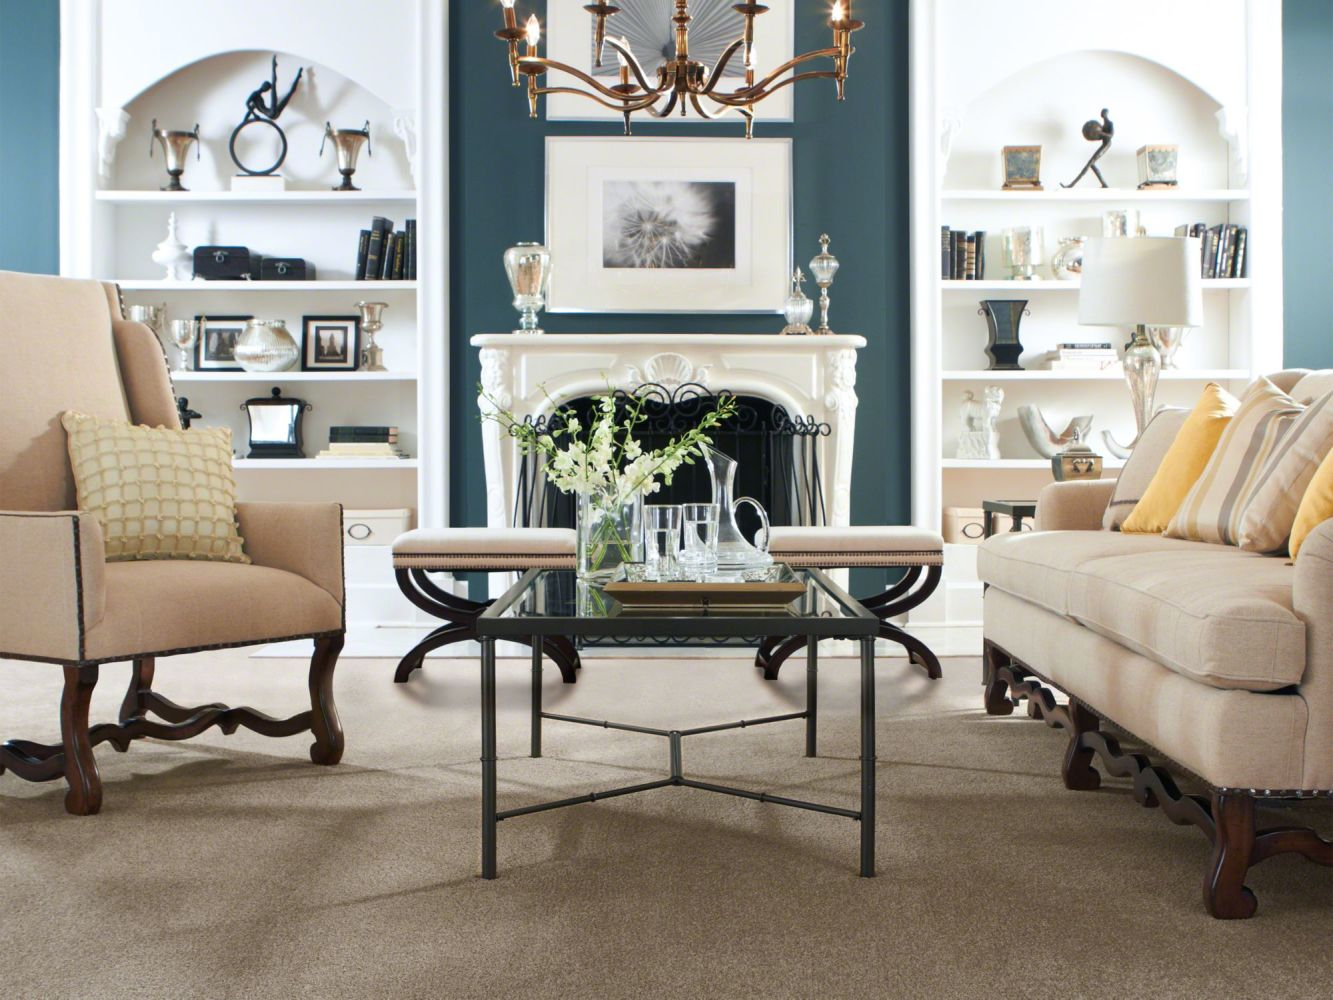 Anderson Tuftex American Home Fashions Joyful Journey Hazelnut 00783_ZA865